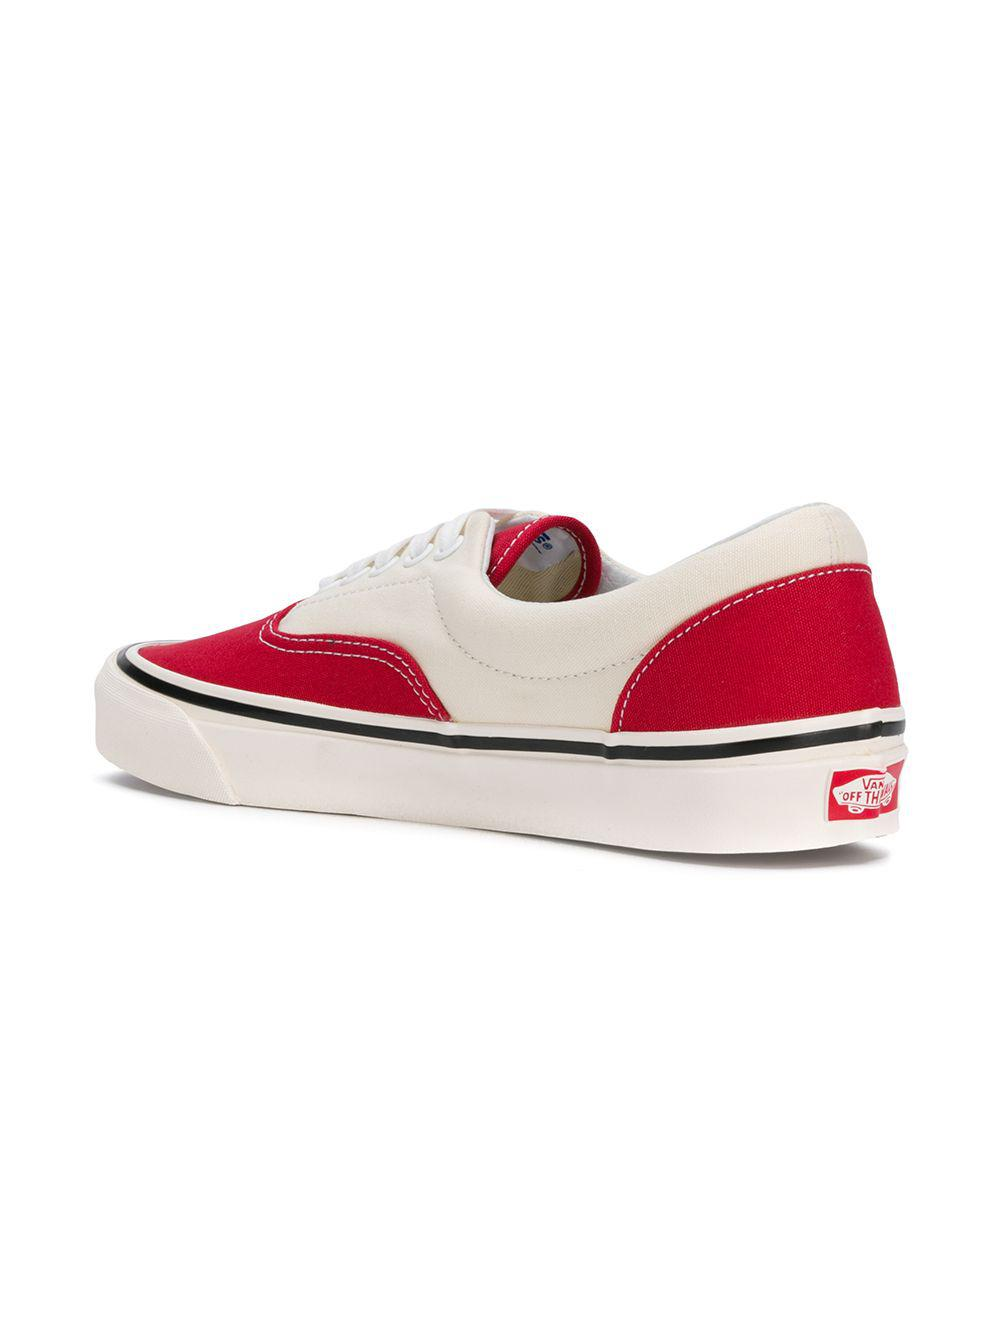 de873dbbc8bd Vans Era 95 Dx in Red for Men - Save 63% - Lyst